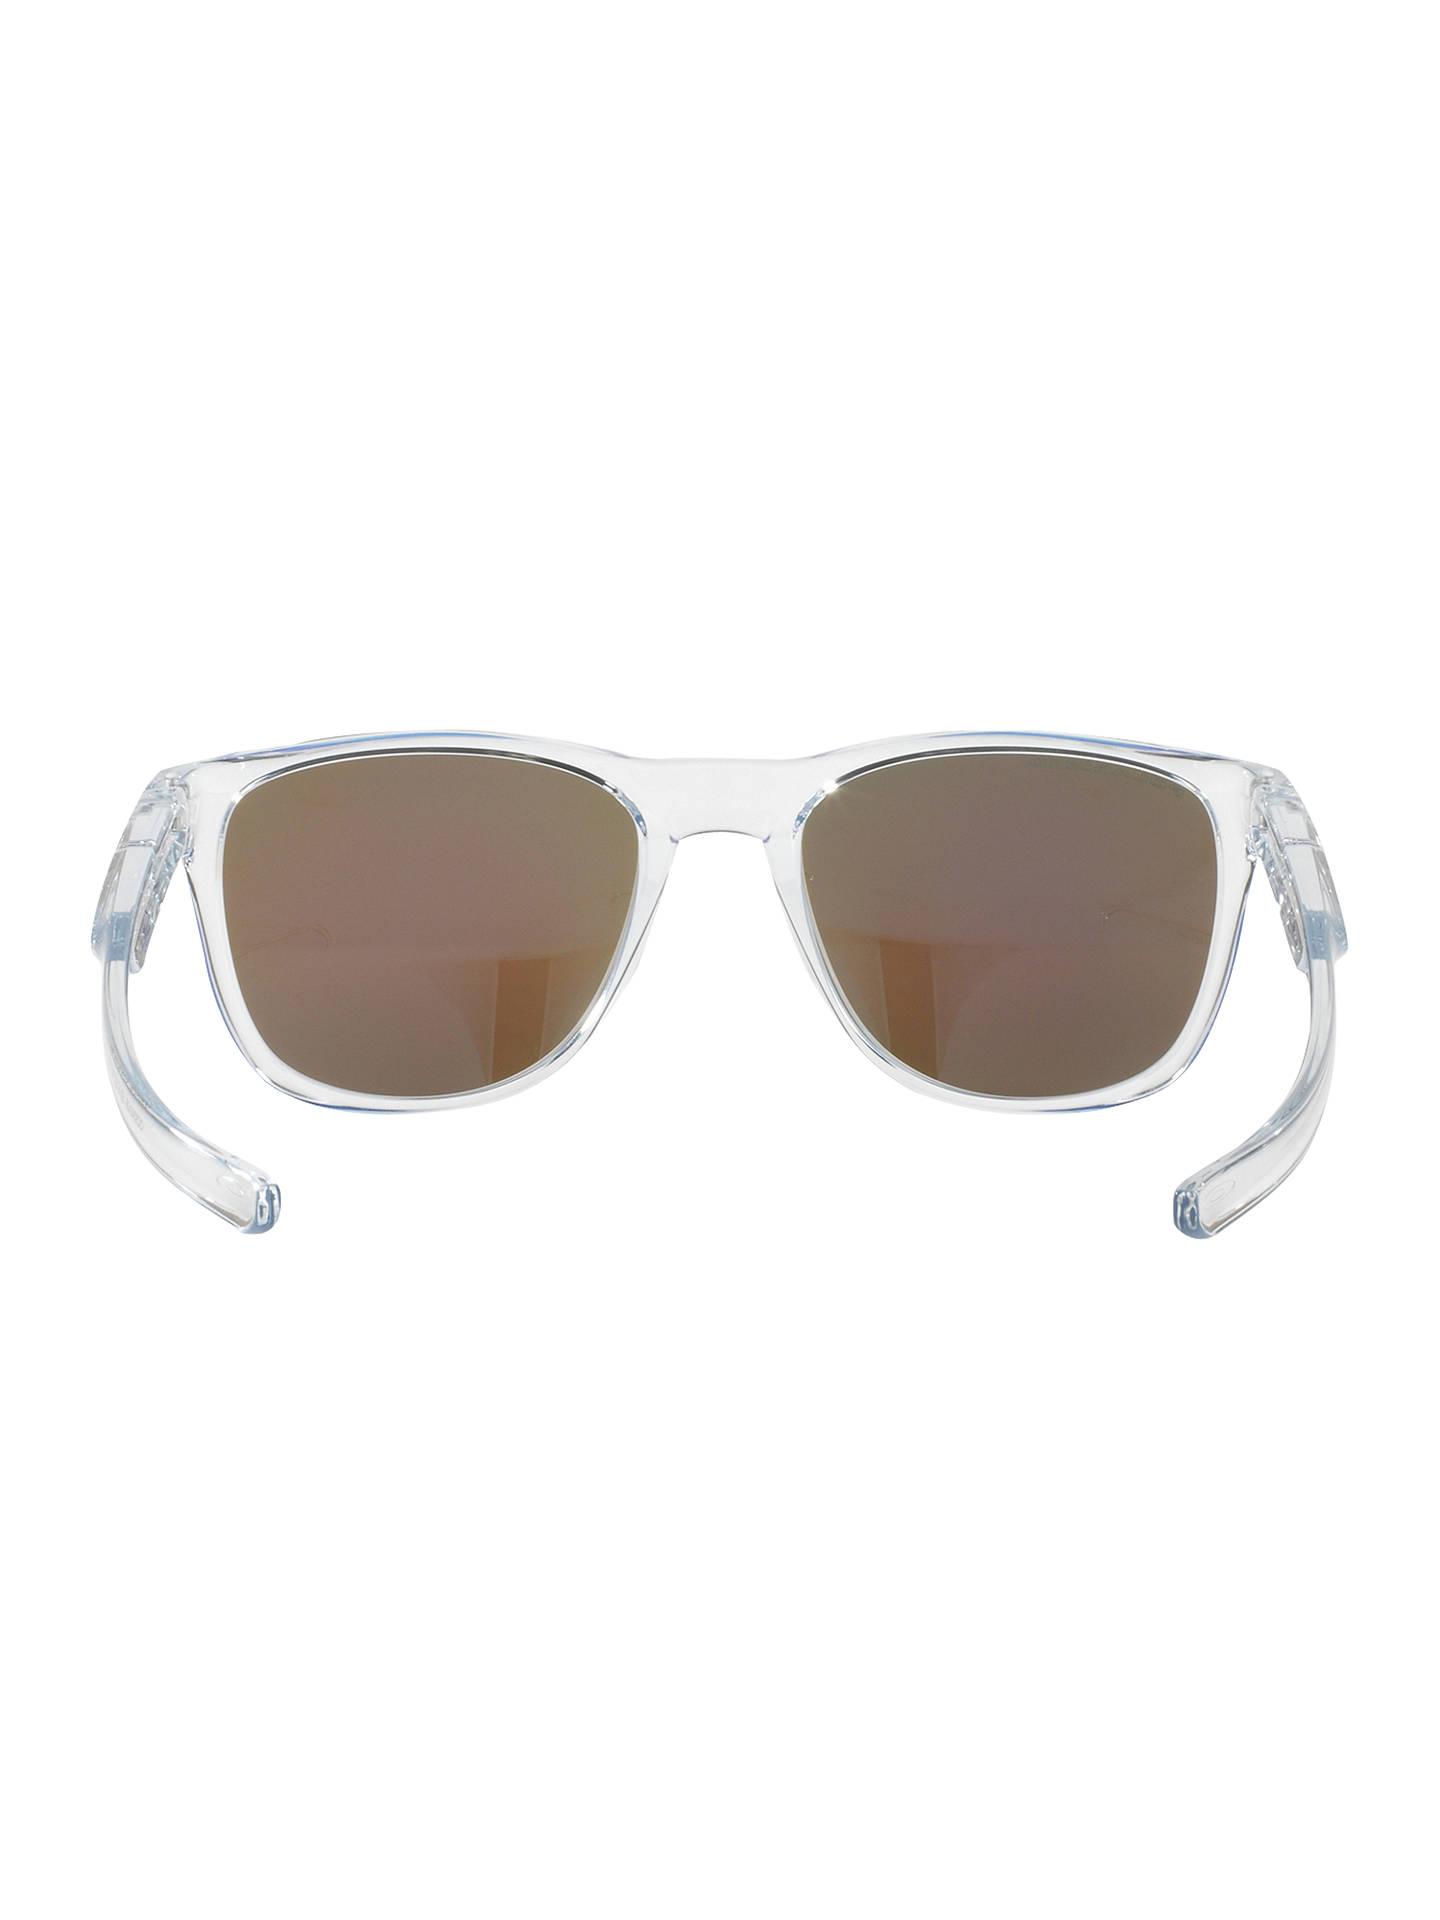 662cf2e7ef Oakley OO9340 Trillbe X Polarised Square Sunglasses at John Lewis ...